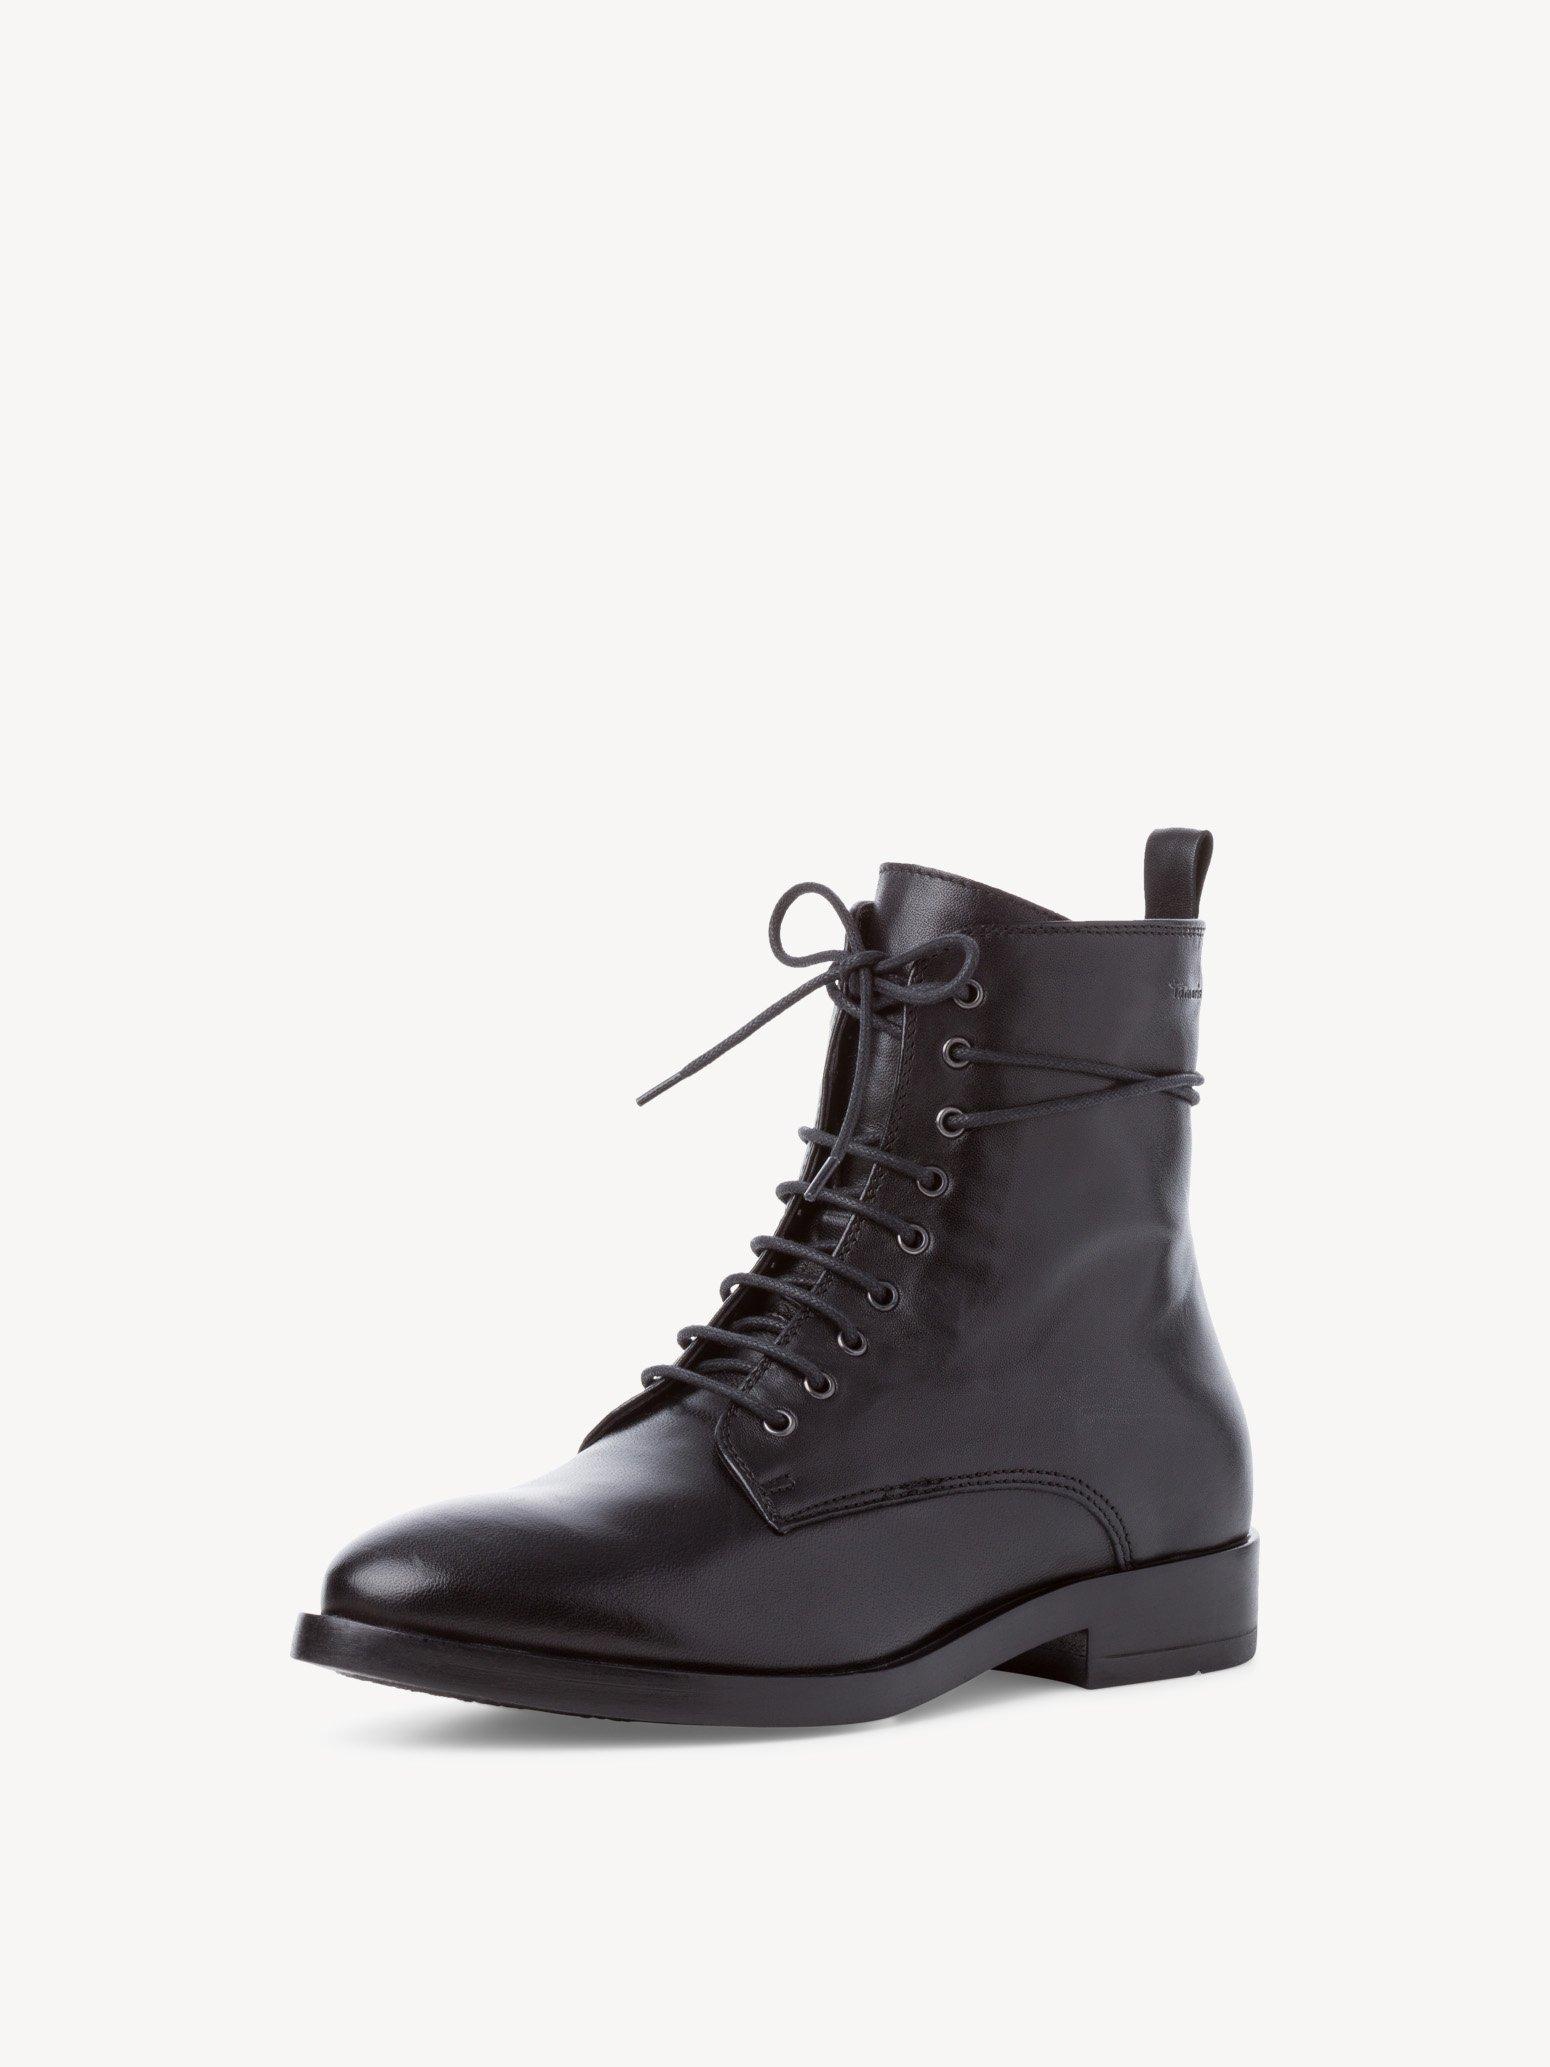 Ботинки Tamaris 1-1-25136-27-001